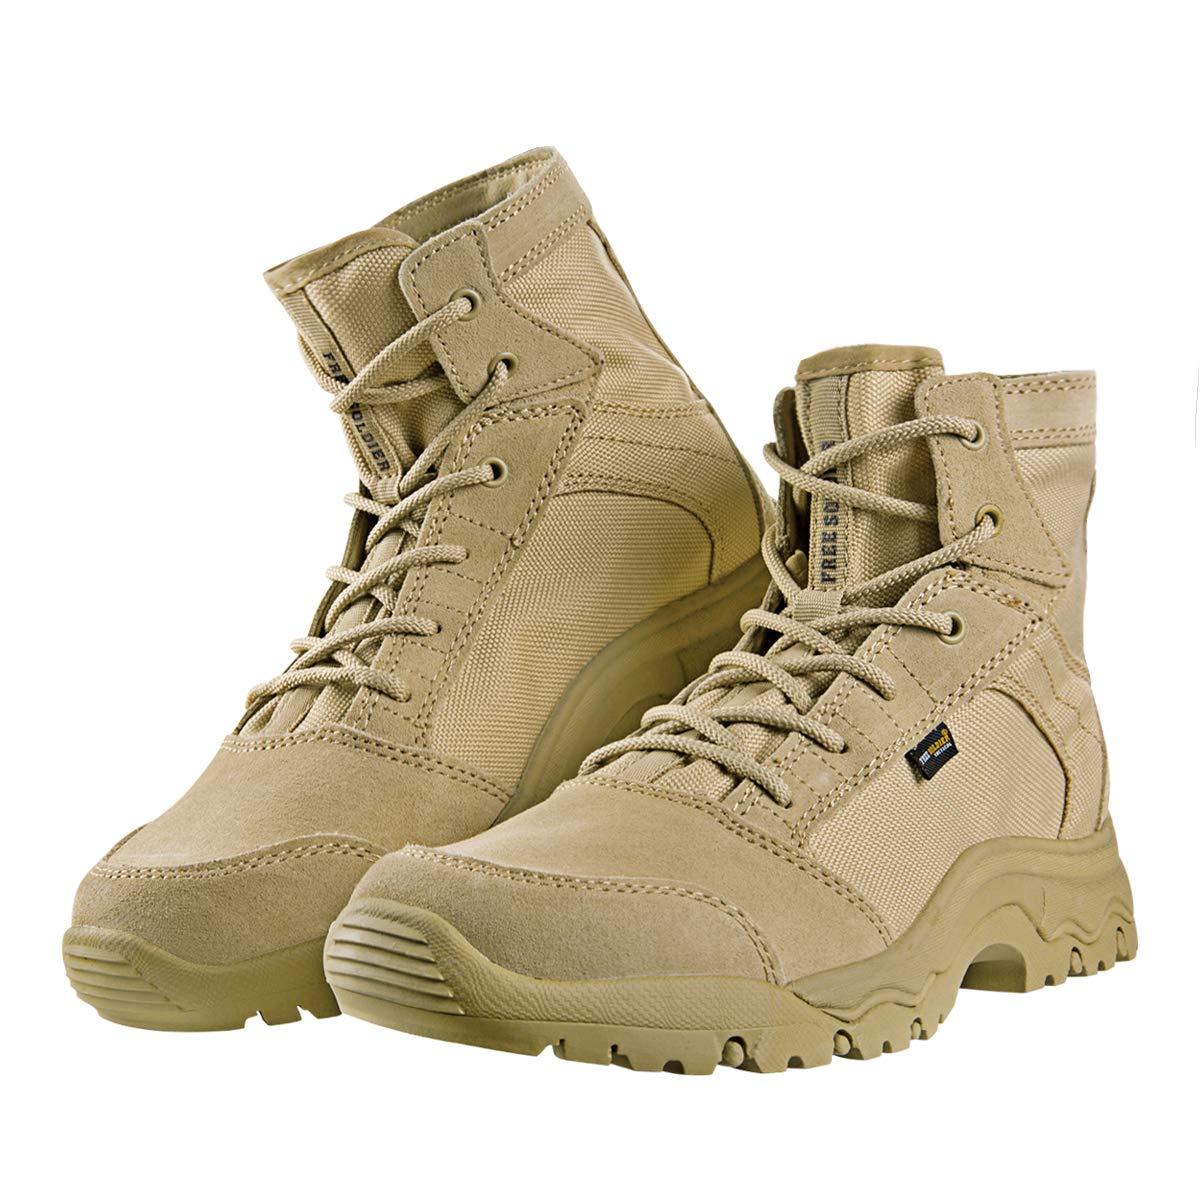 Free SoldierアウトドアメンズStorm Ultralightタクティカルブーツ通気性耐久性軽量靴 11.5 US サンド 色 B07F85YQ2P